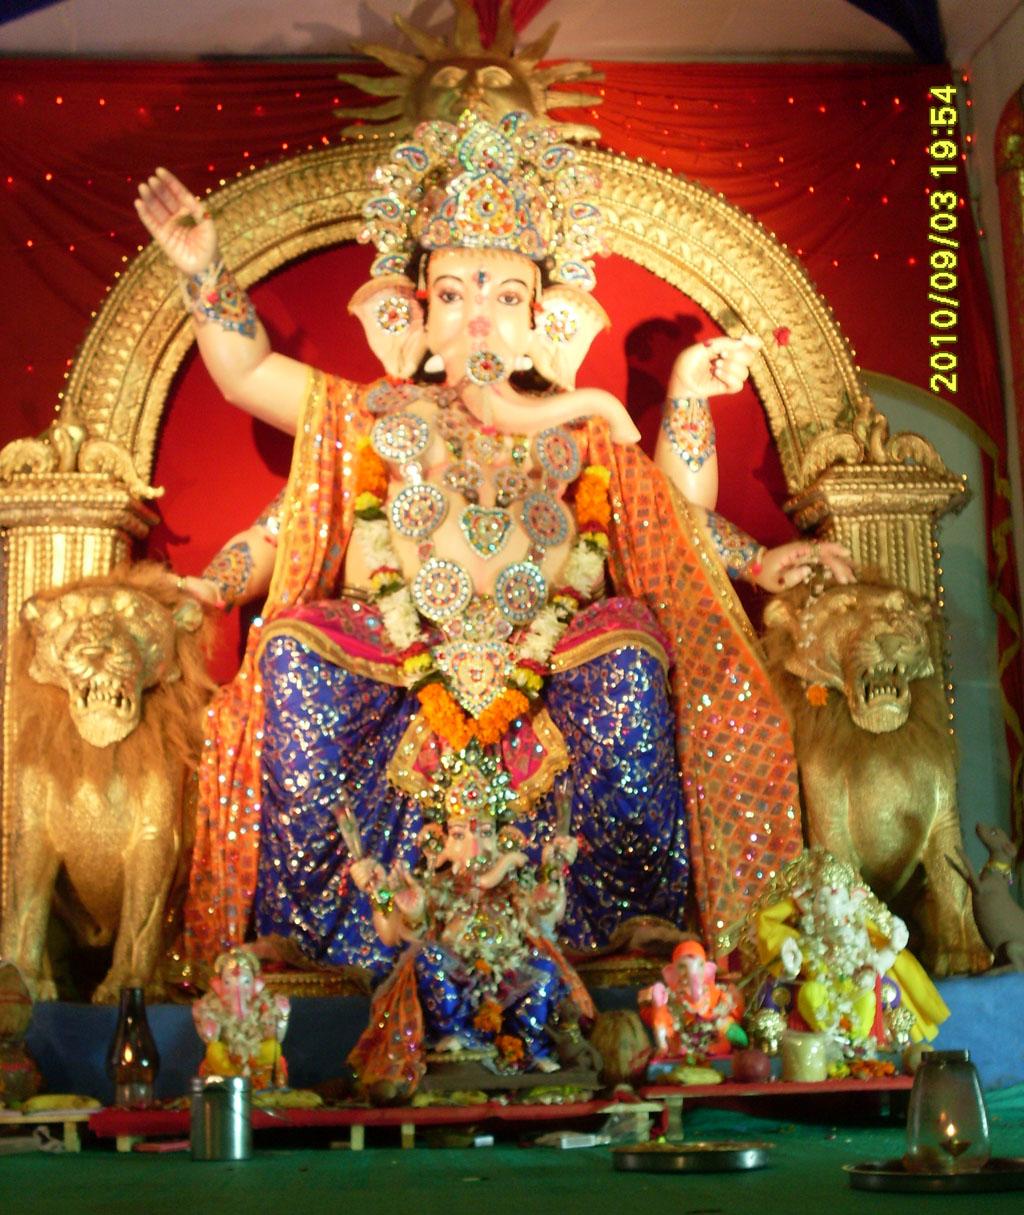 HINDU GOD WALLPAPER, GOD PHOTO, FESTIVAL AND EVENTS, GODDESS PICTURE, LEGENDS, FESTIVALS: Ganesh